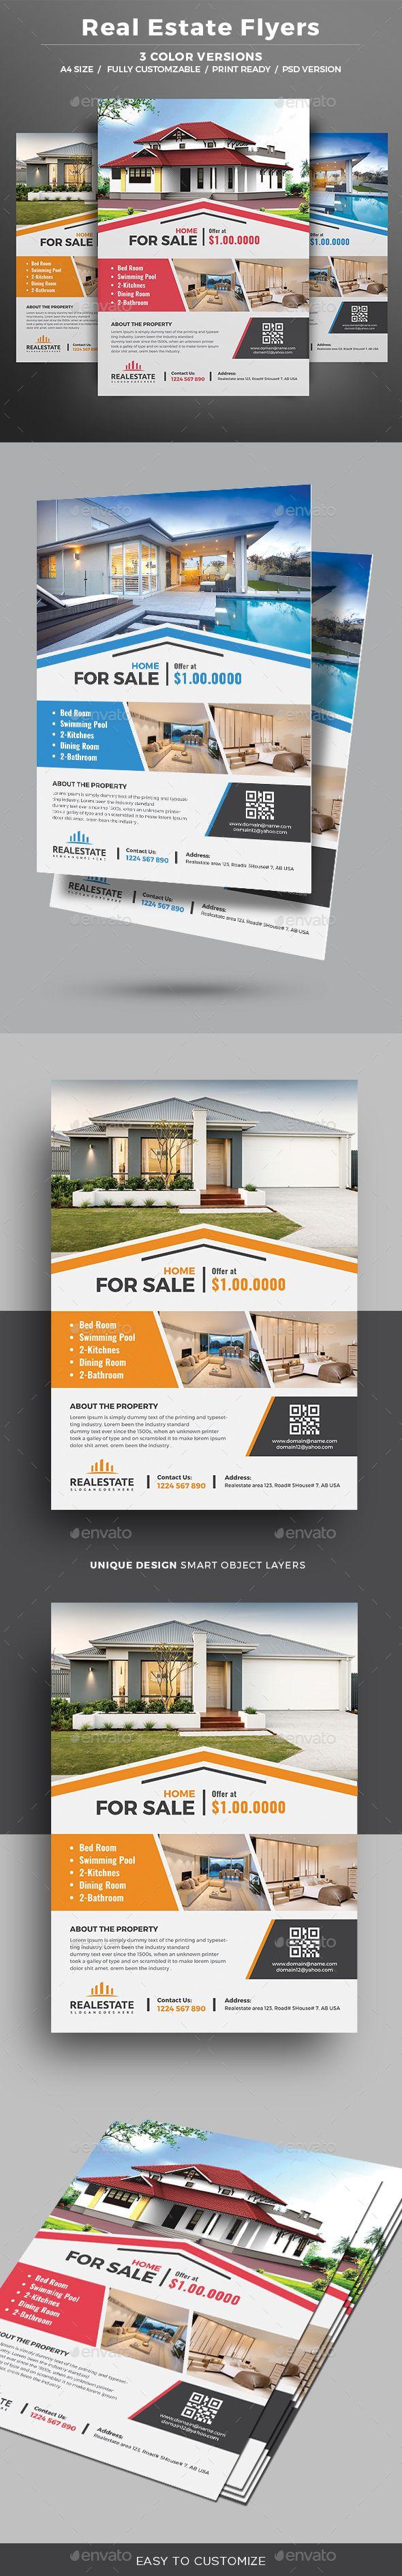 Real Estate Flyer Template PSD. Download here: https://graphicriver.net/item/real-estate-flyer/17193082?ref=ksioks